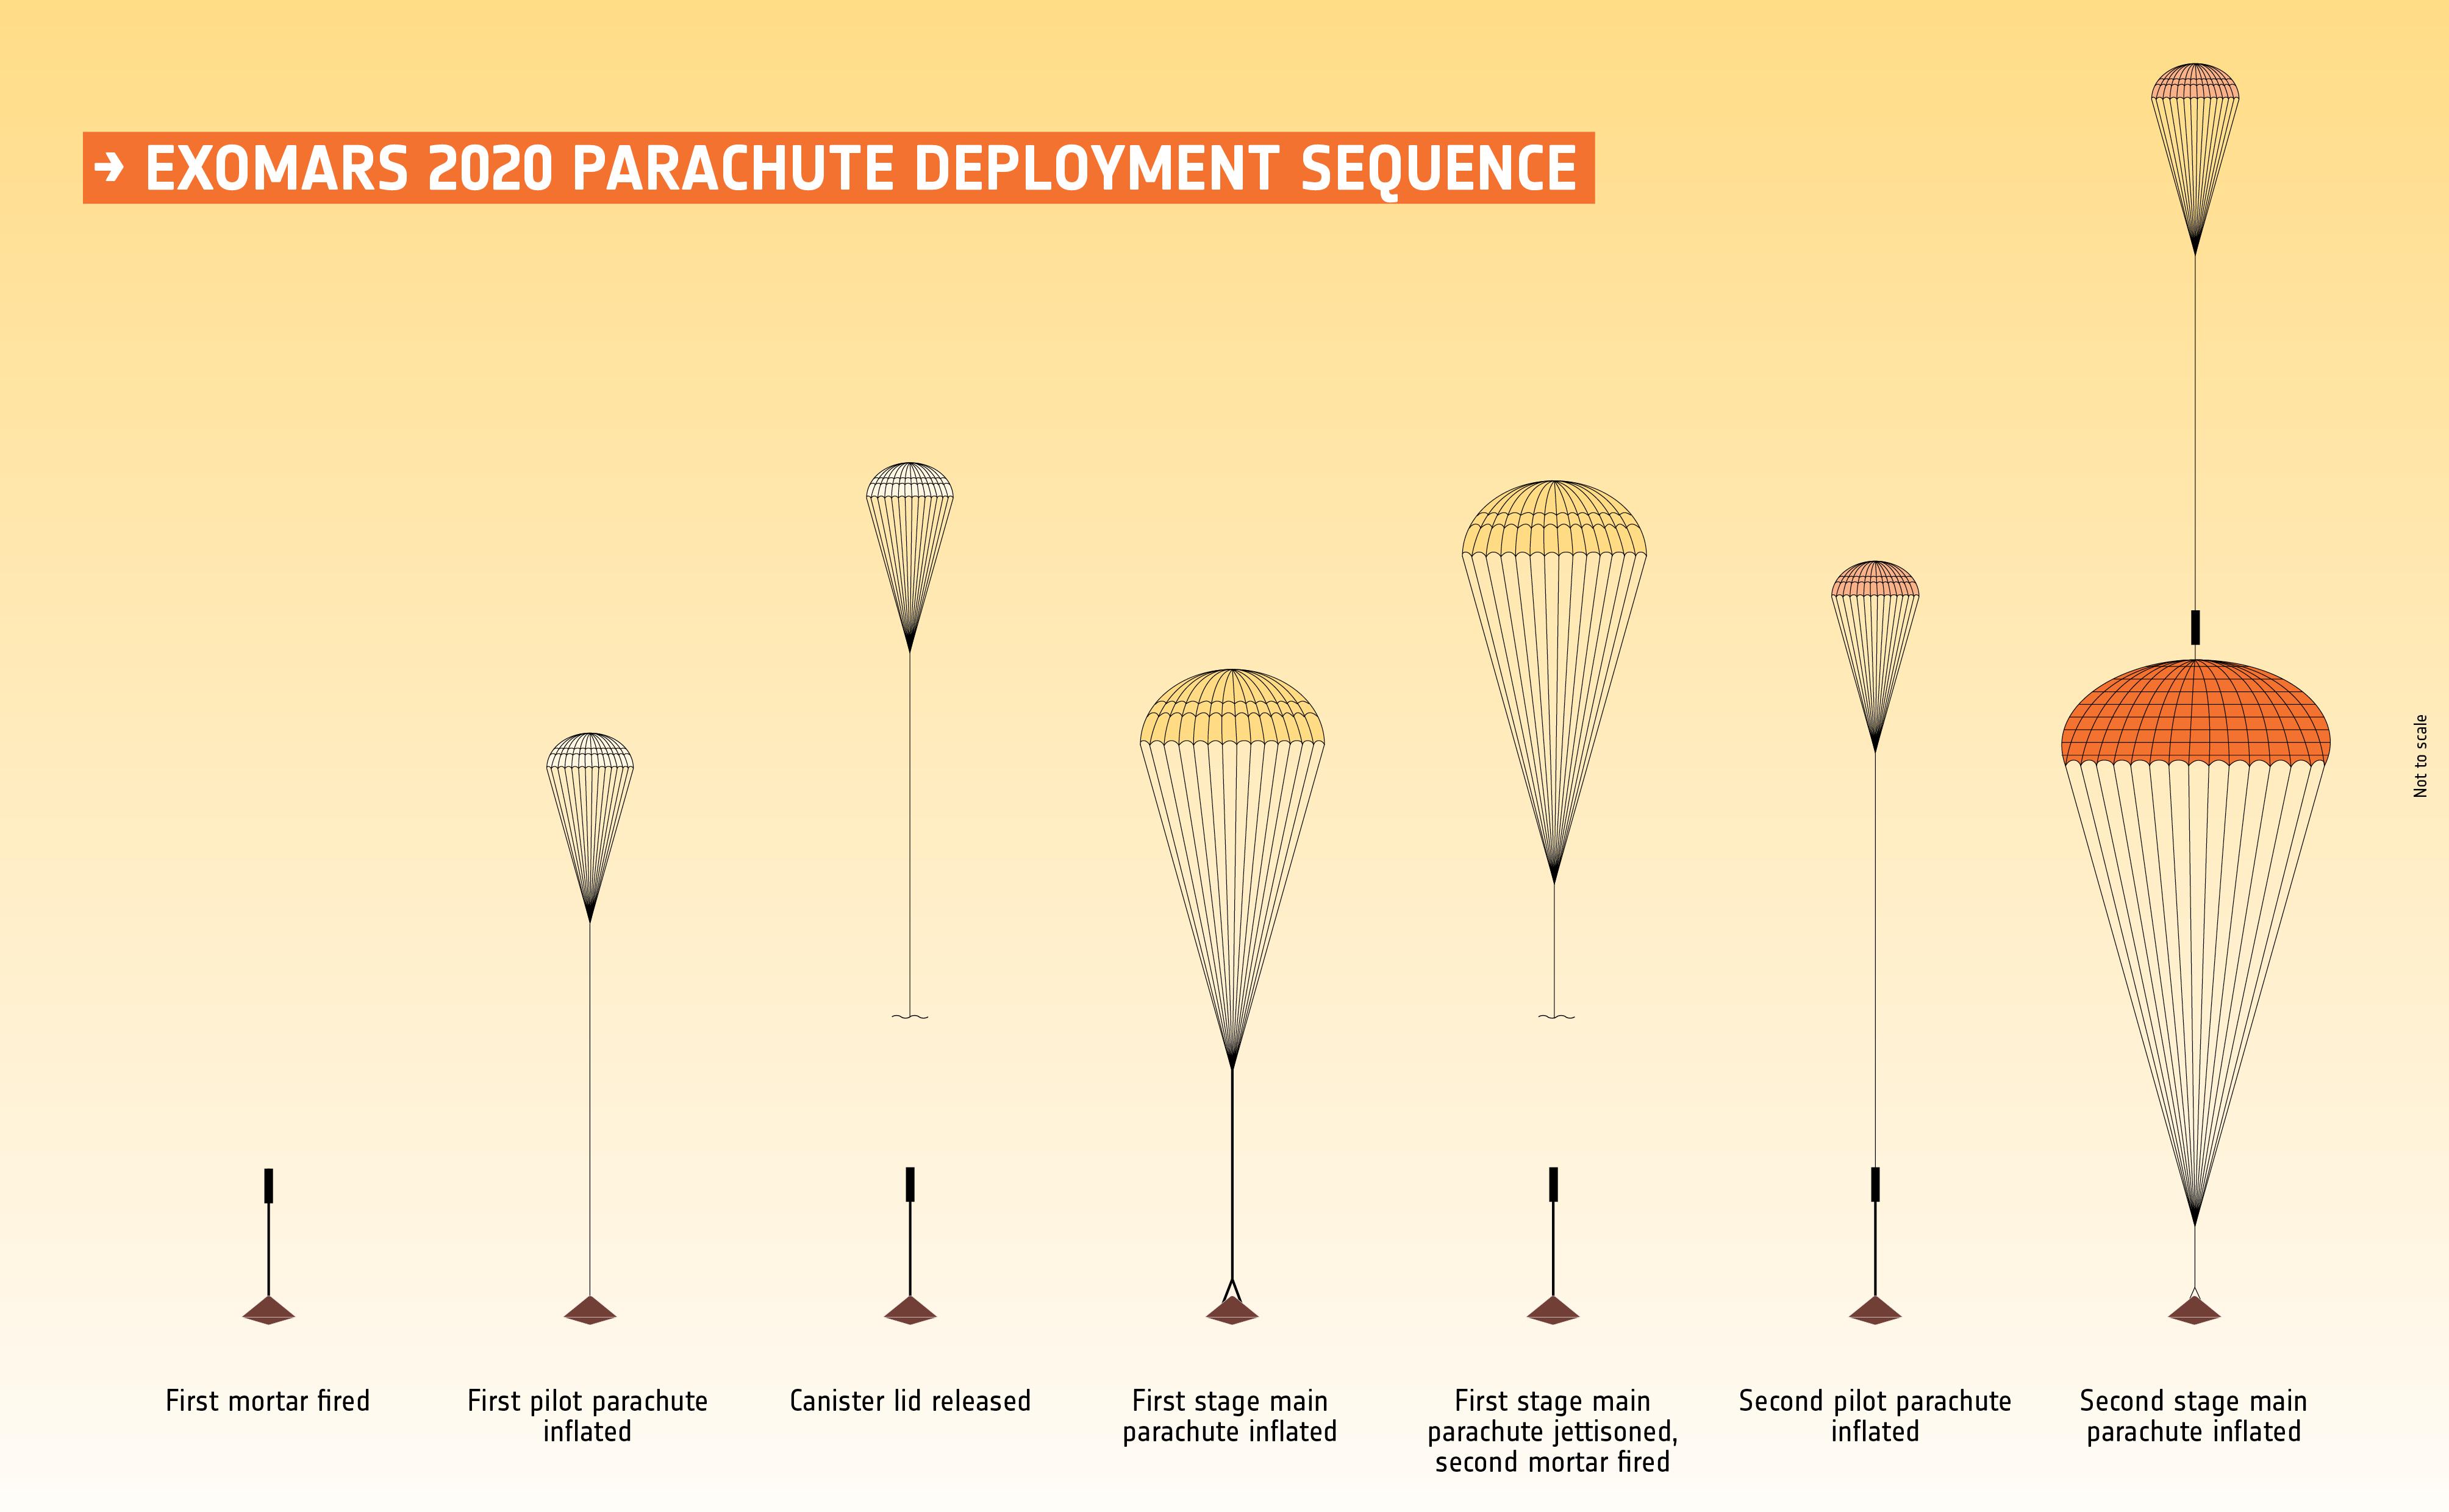 ExoMars 2020 parachute deployment sequence.